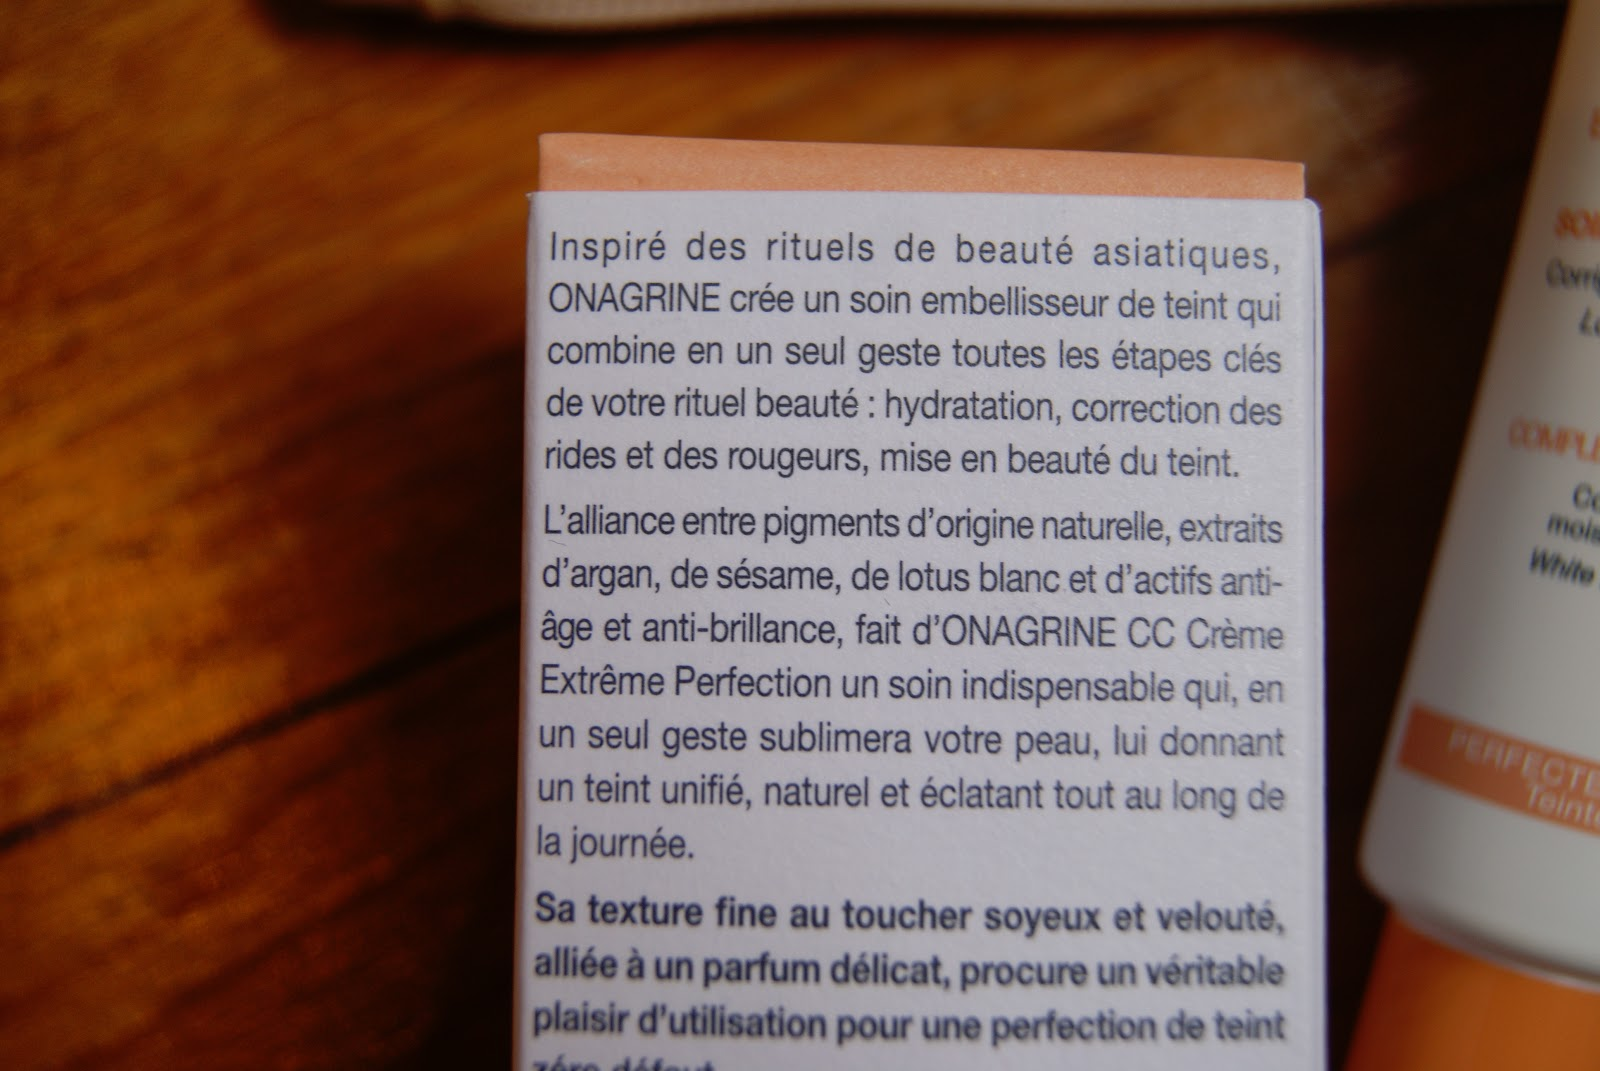 CC Crème ONAGRINE